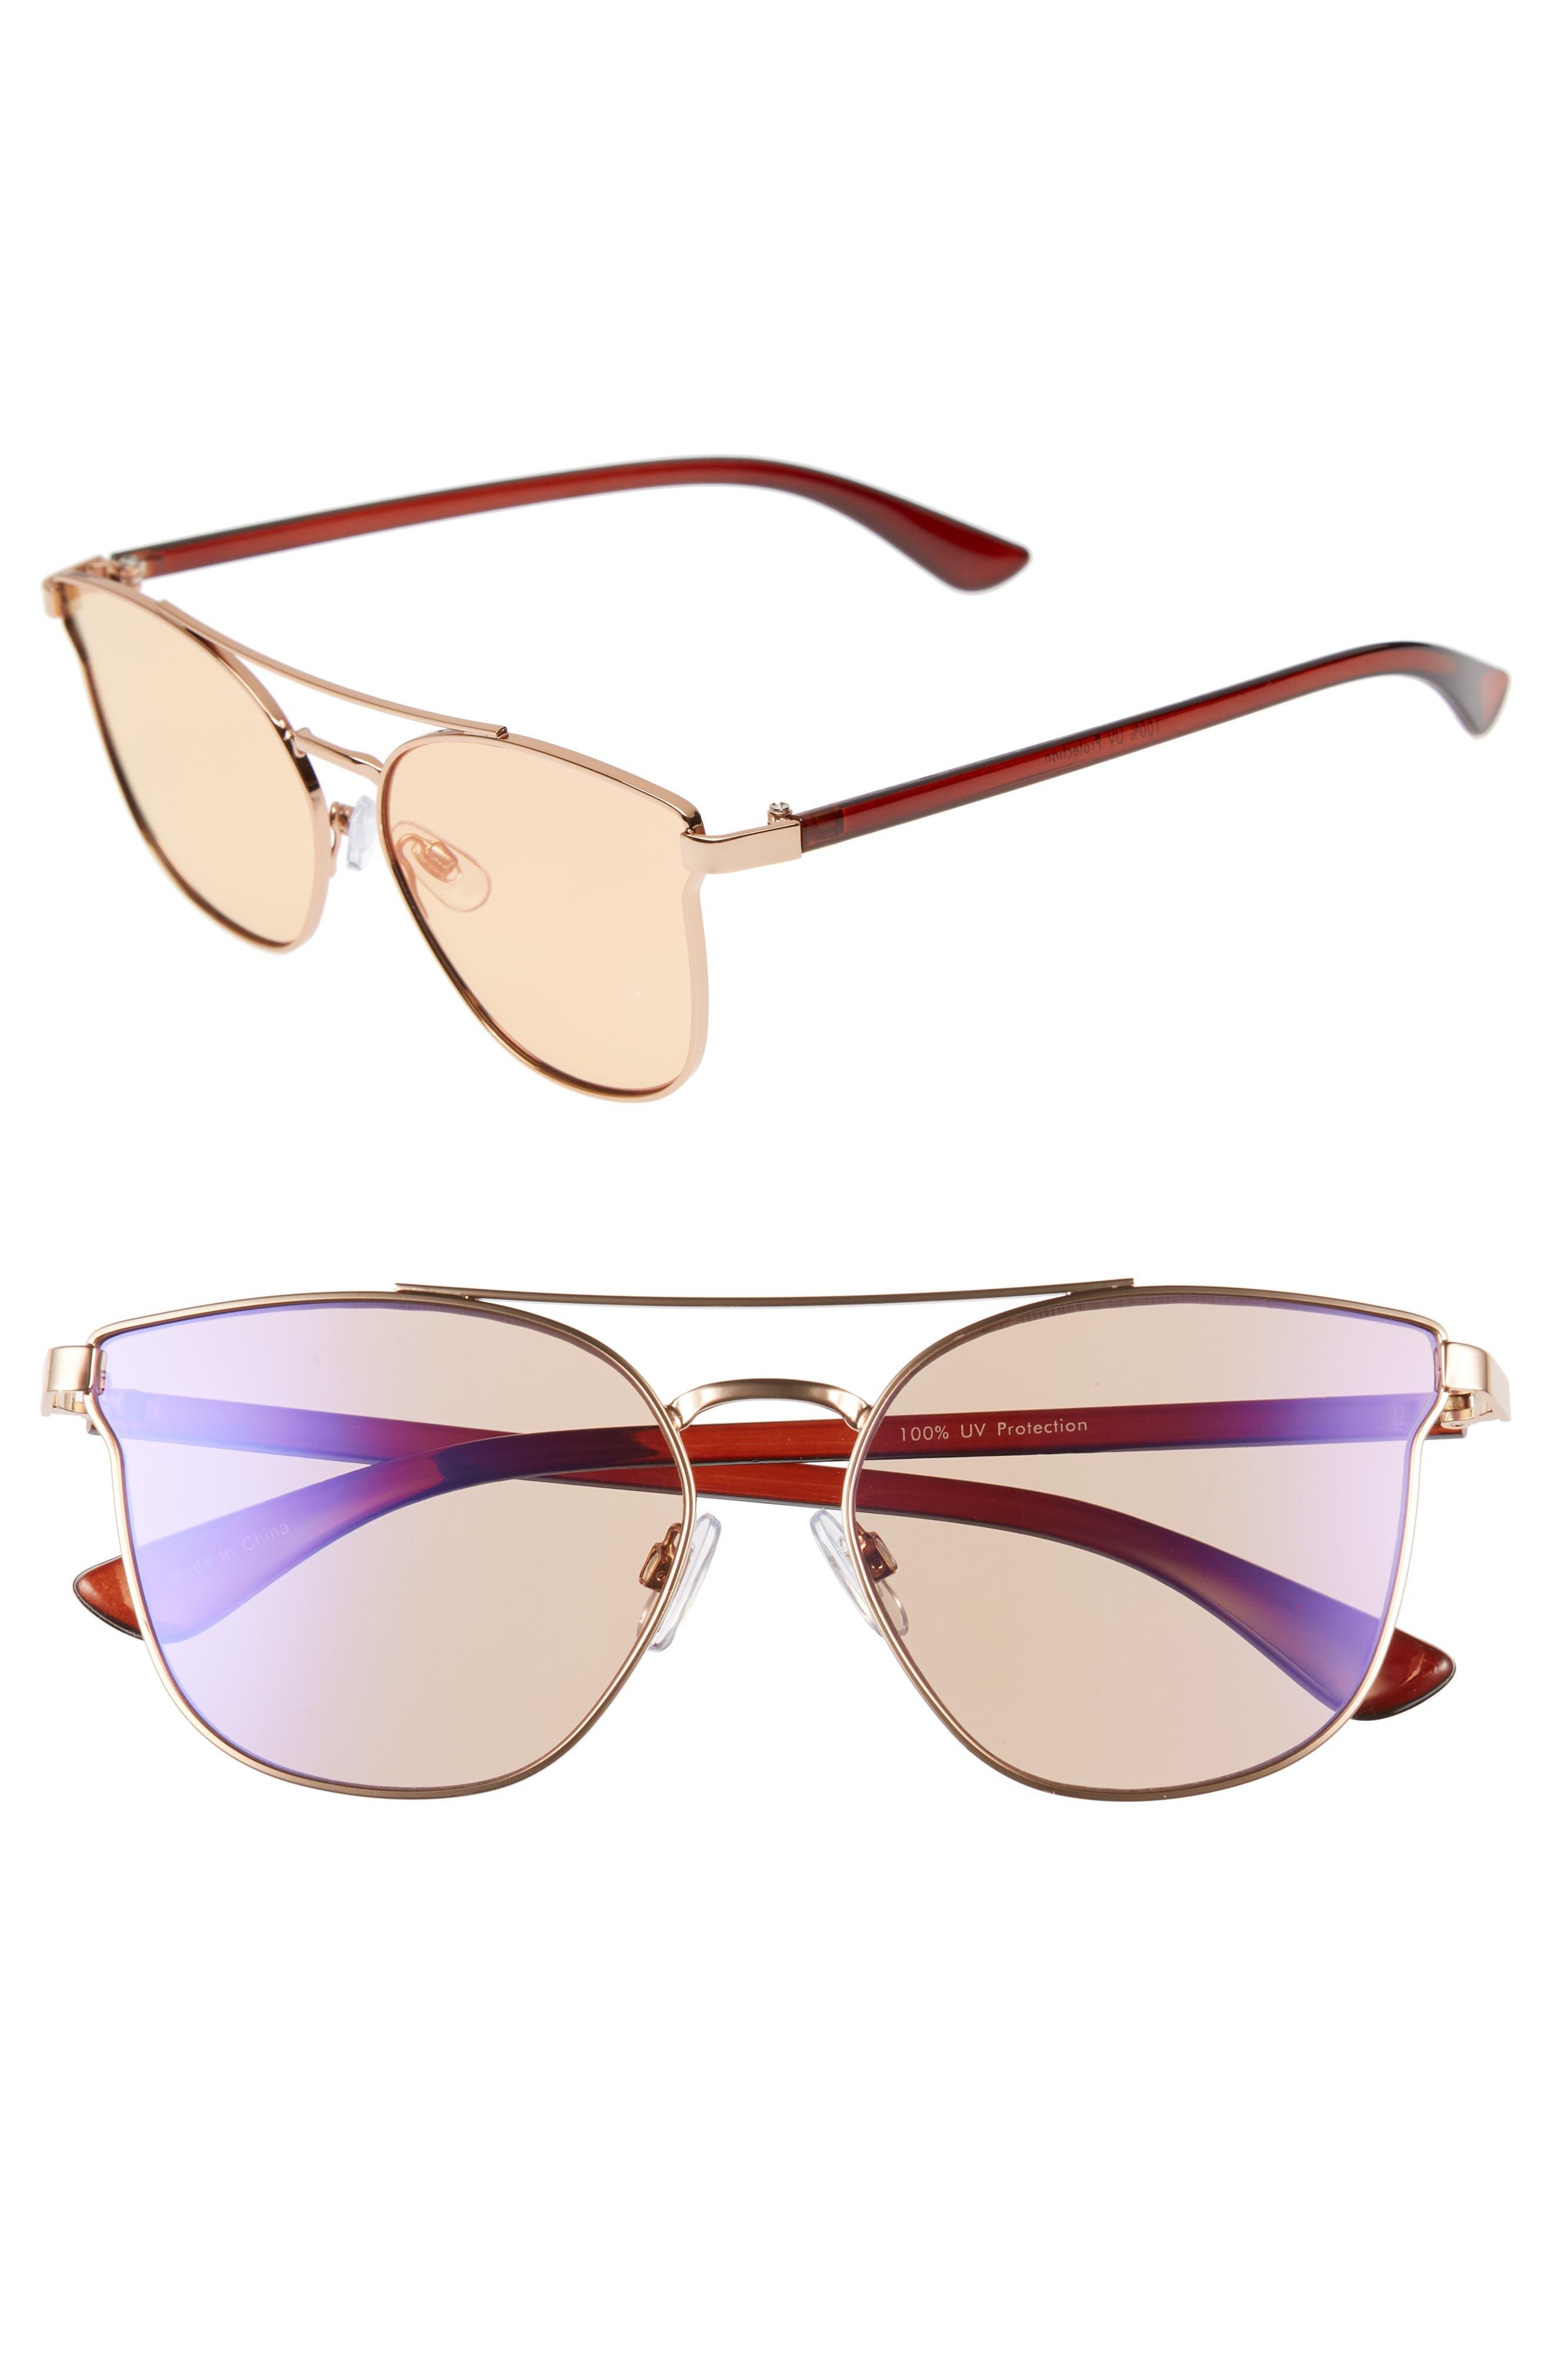 56mm Flat Mirrored Aviator Sunglasses,                         Main,                         color, BRONZE/ BROWN